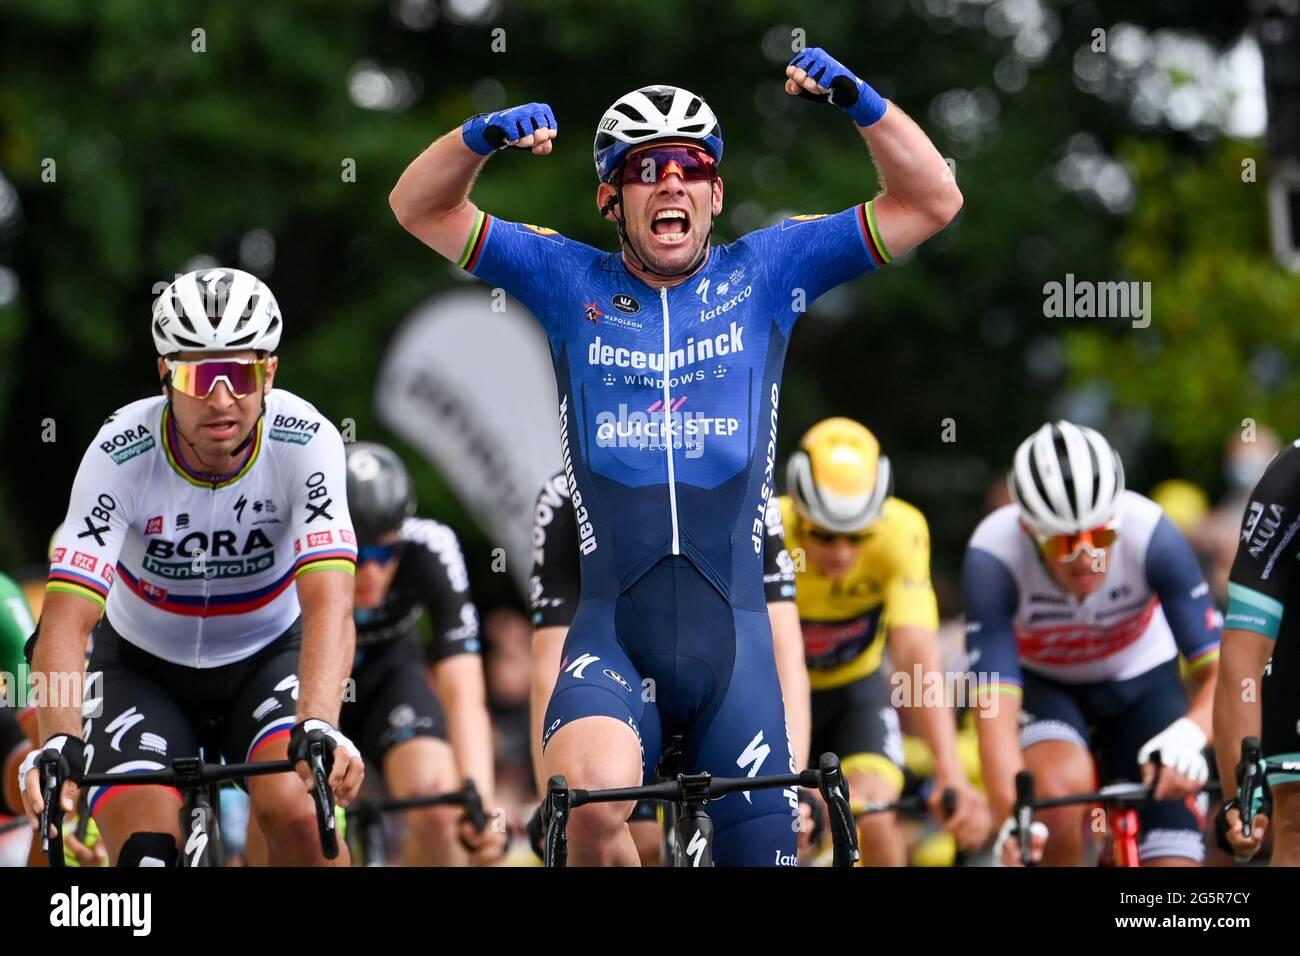 Francia, Fougeres, Redon, 29/06/2021, Tour de France 2021, fase 4, Redon a Fougeres. Mark Cavendish della Gran Bretagna per Deceuninck Quickstep vince il palco in un finale sprint. Foto Stock